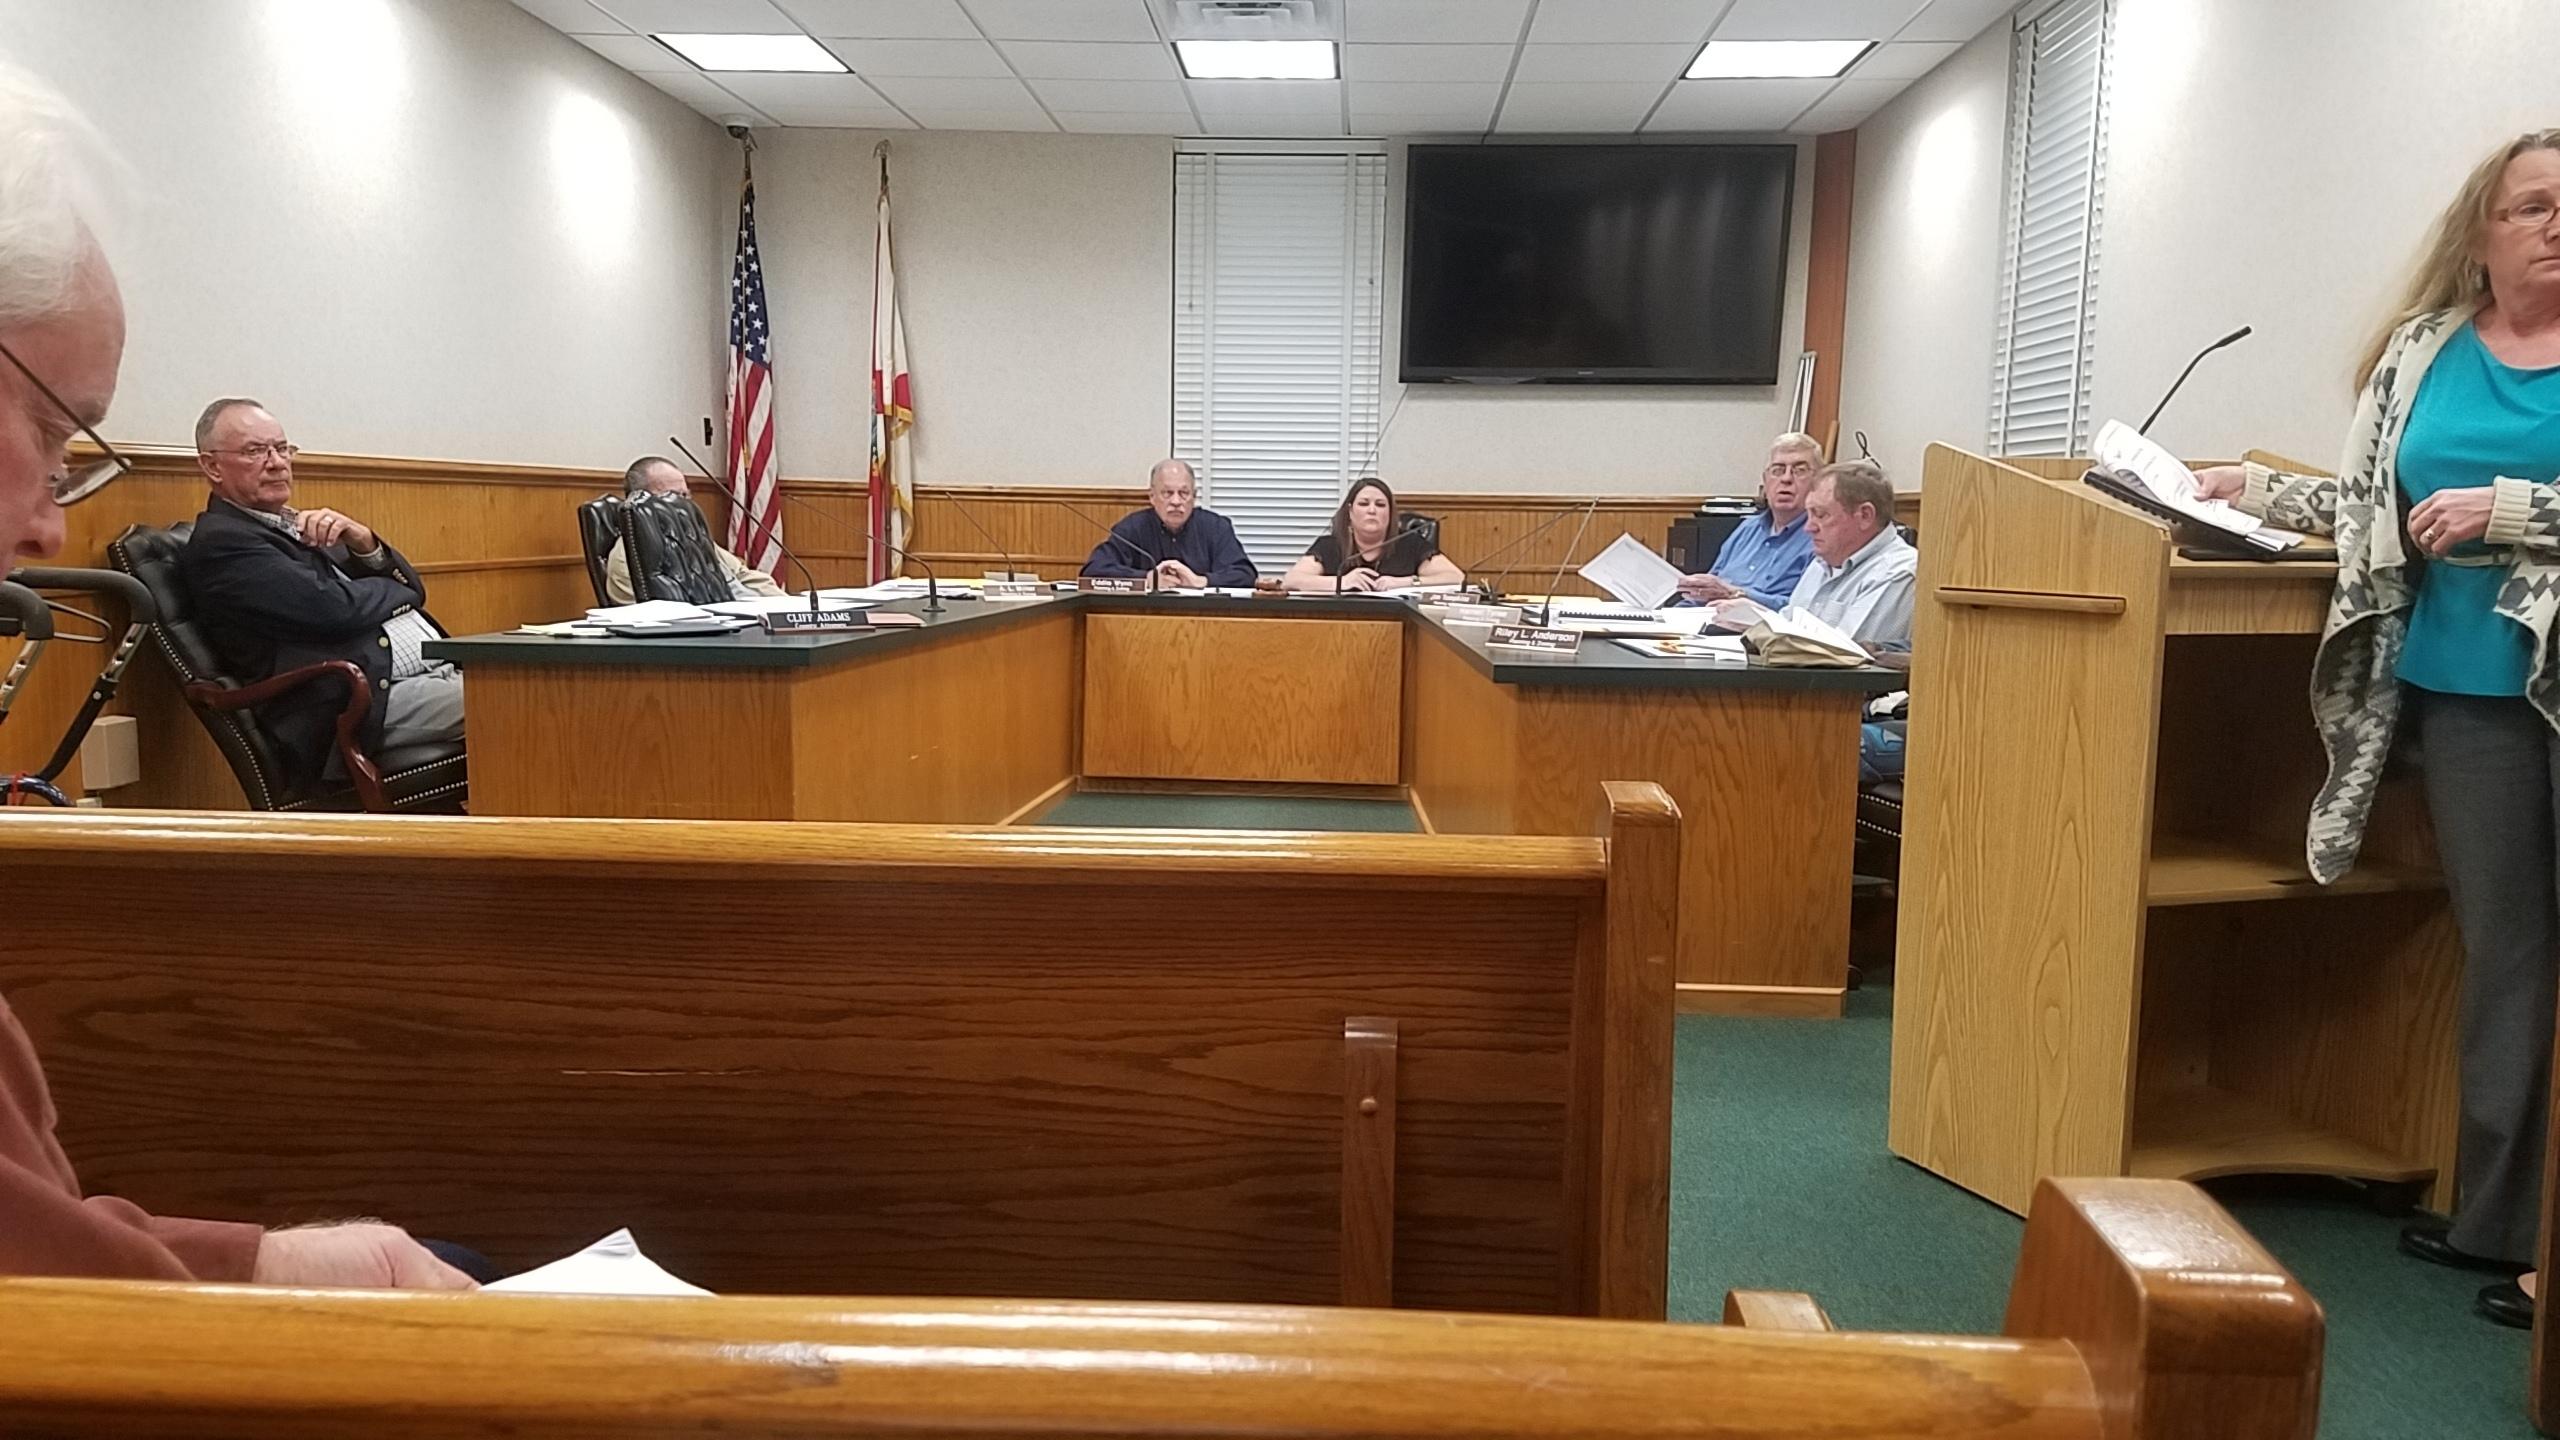 2560x1440 Deanna Mericle questions PCS, Public Comment, in PCS Phosphate mine permit Public Hearings, Jasper, FL, by John S. Quarterman, for WWALS.net, 23 January 2018